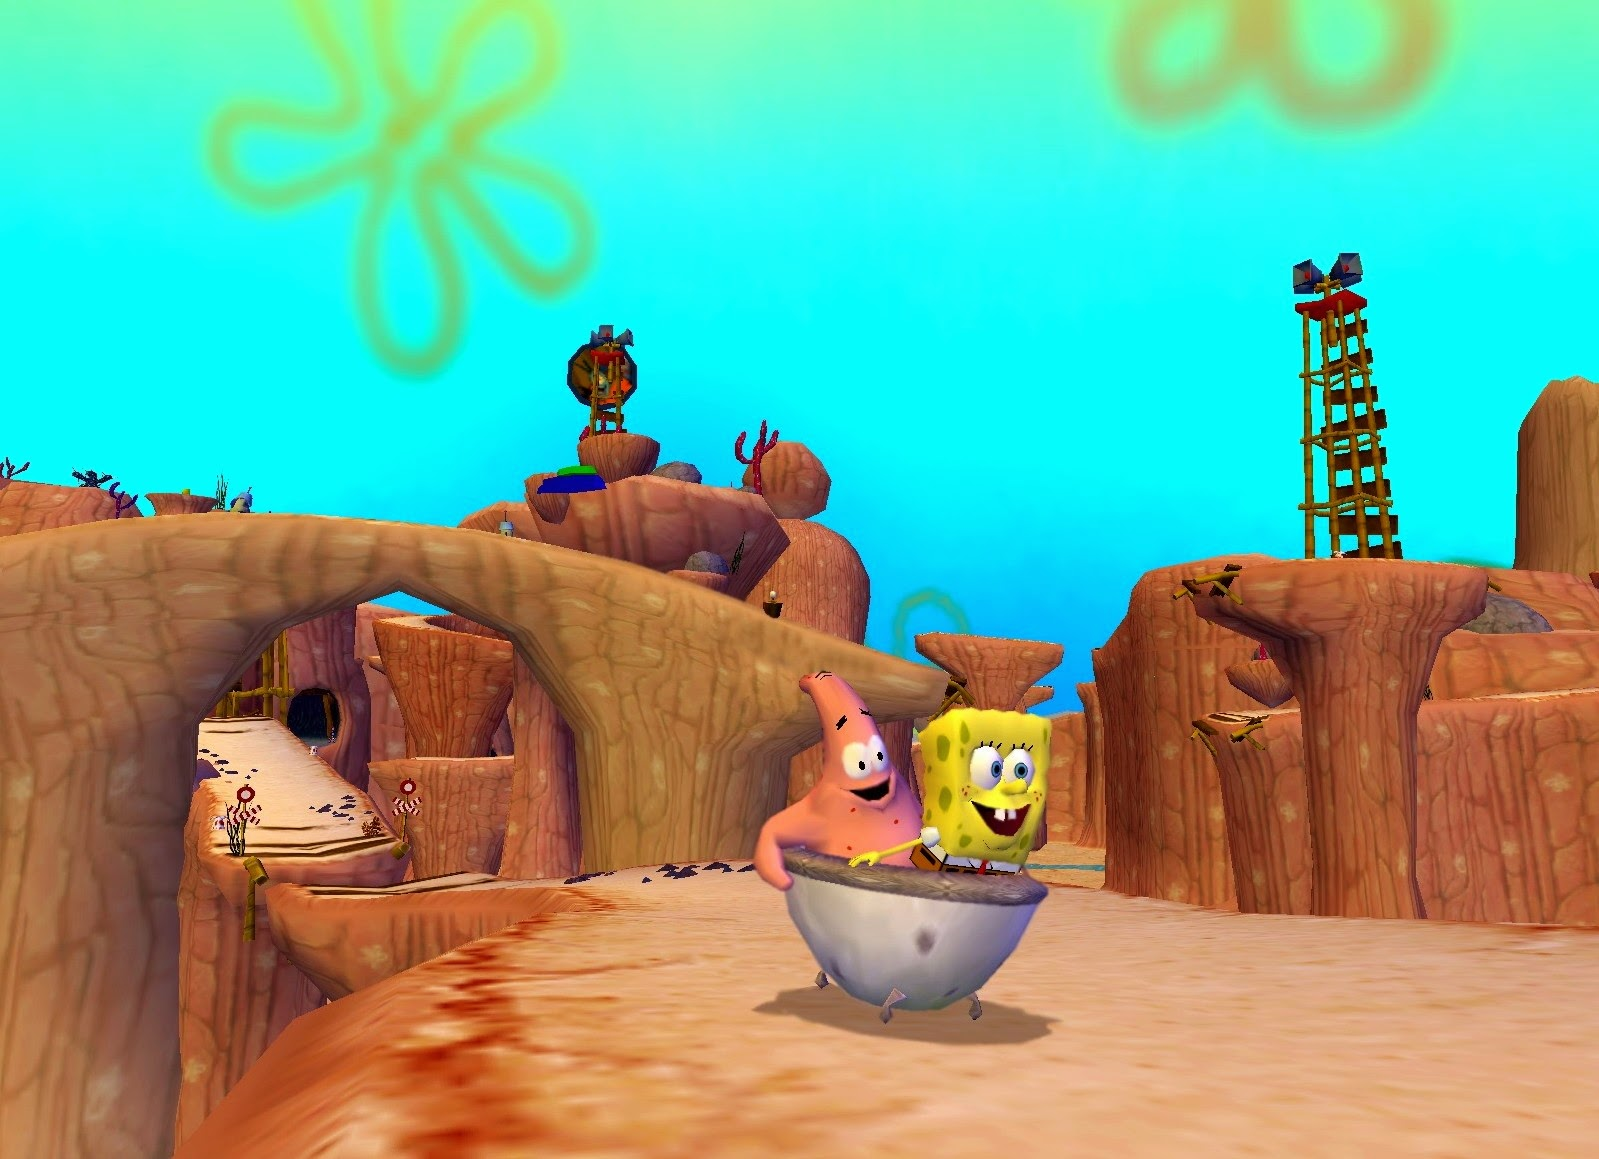 the spongebob squarepants movie game free download full